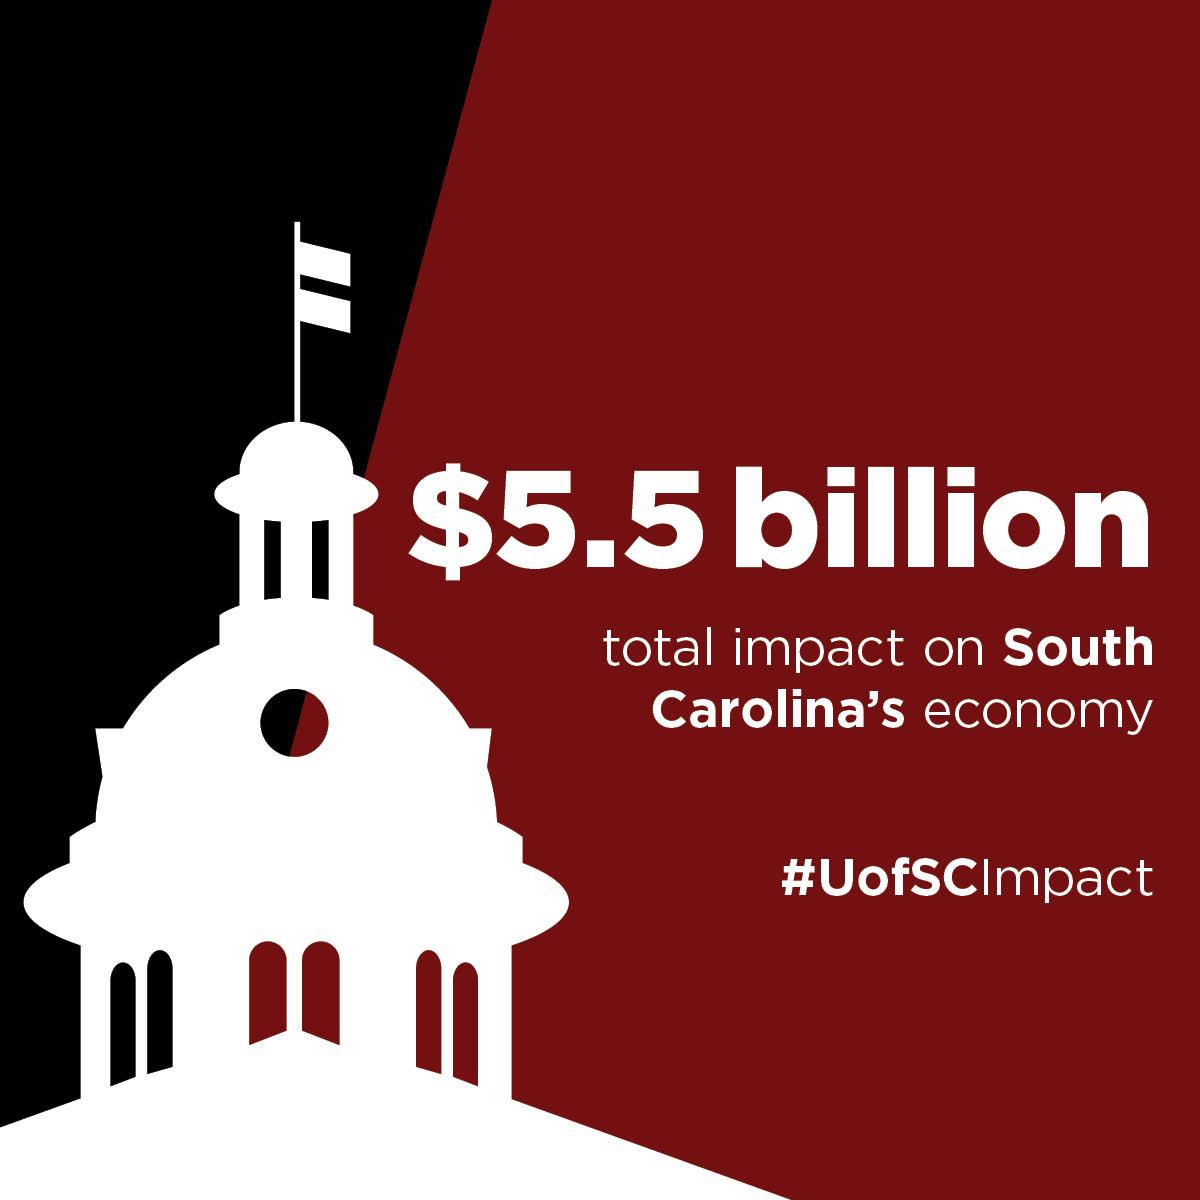 $5.5 Billion total impact on South Carolina's economy #UofSCImpact